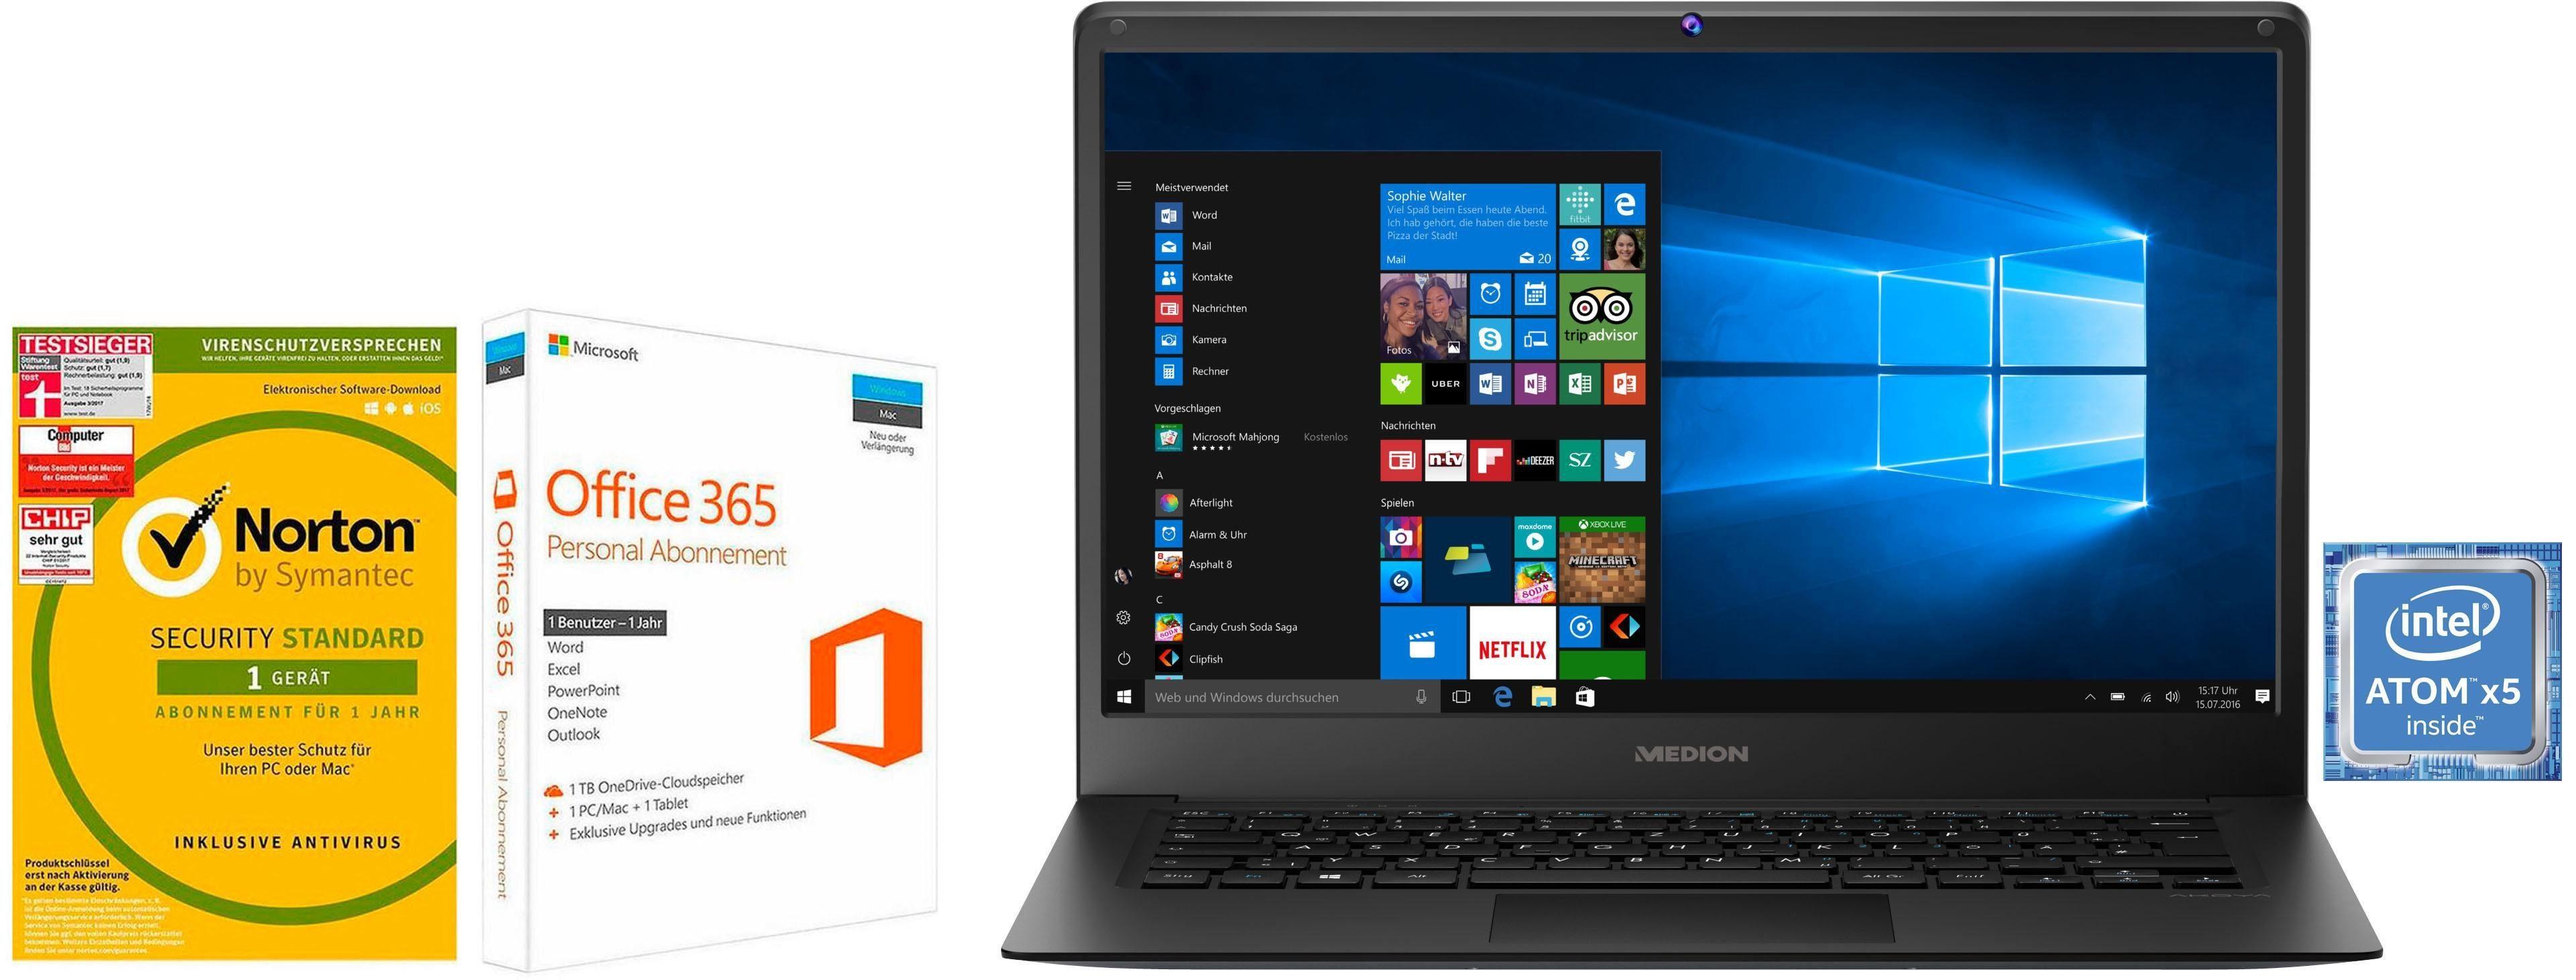 Medion® Akoya E4241 Notebook (35,6 cm/14 Zoll, Intel Atom, , 64 GB SSD)